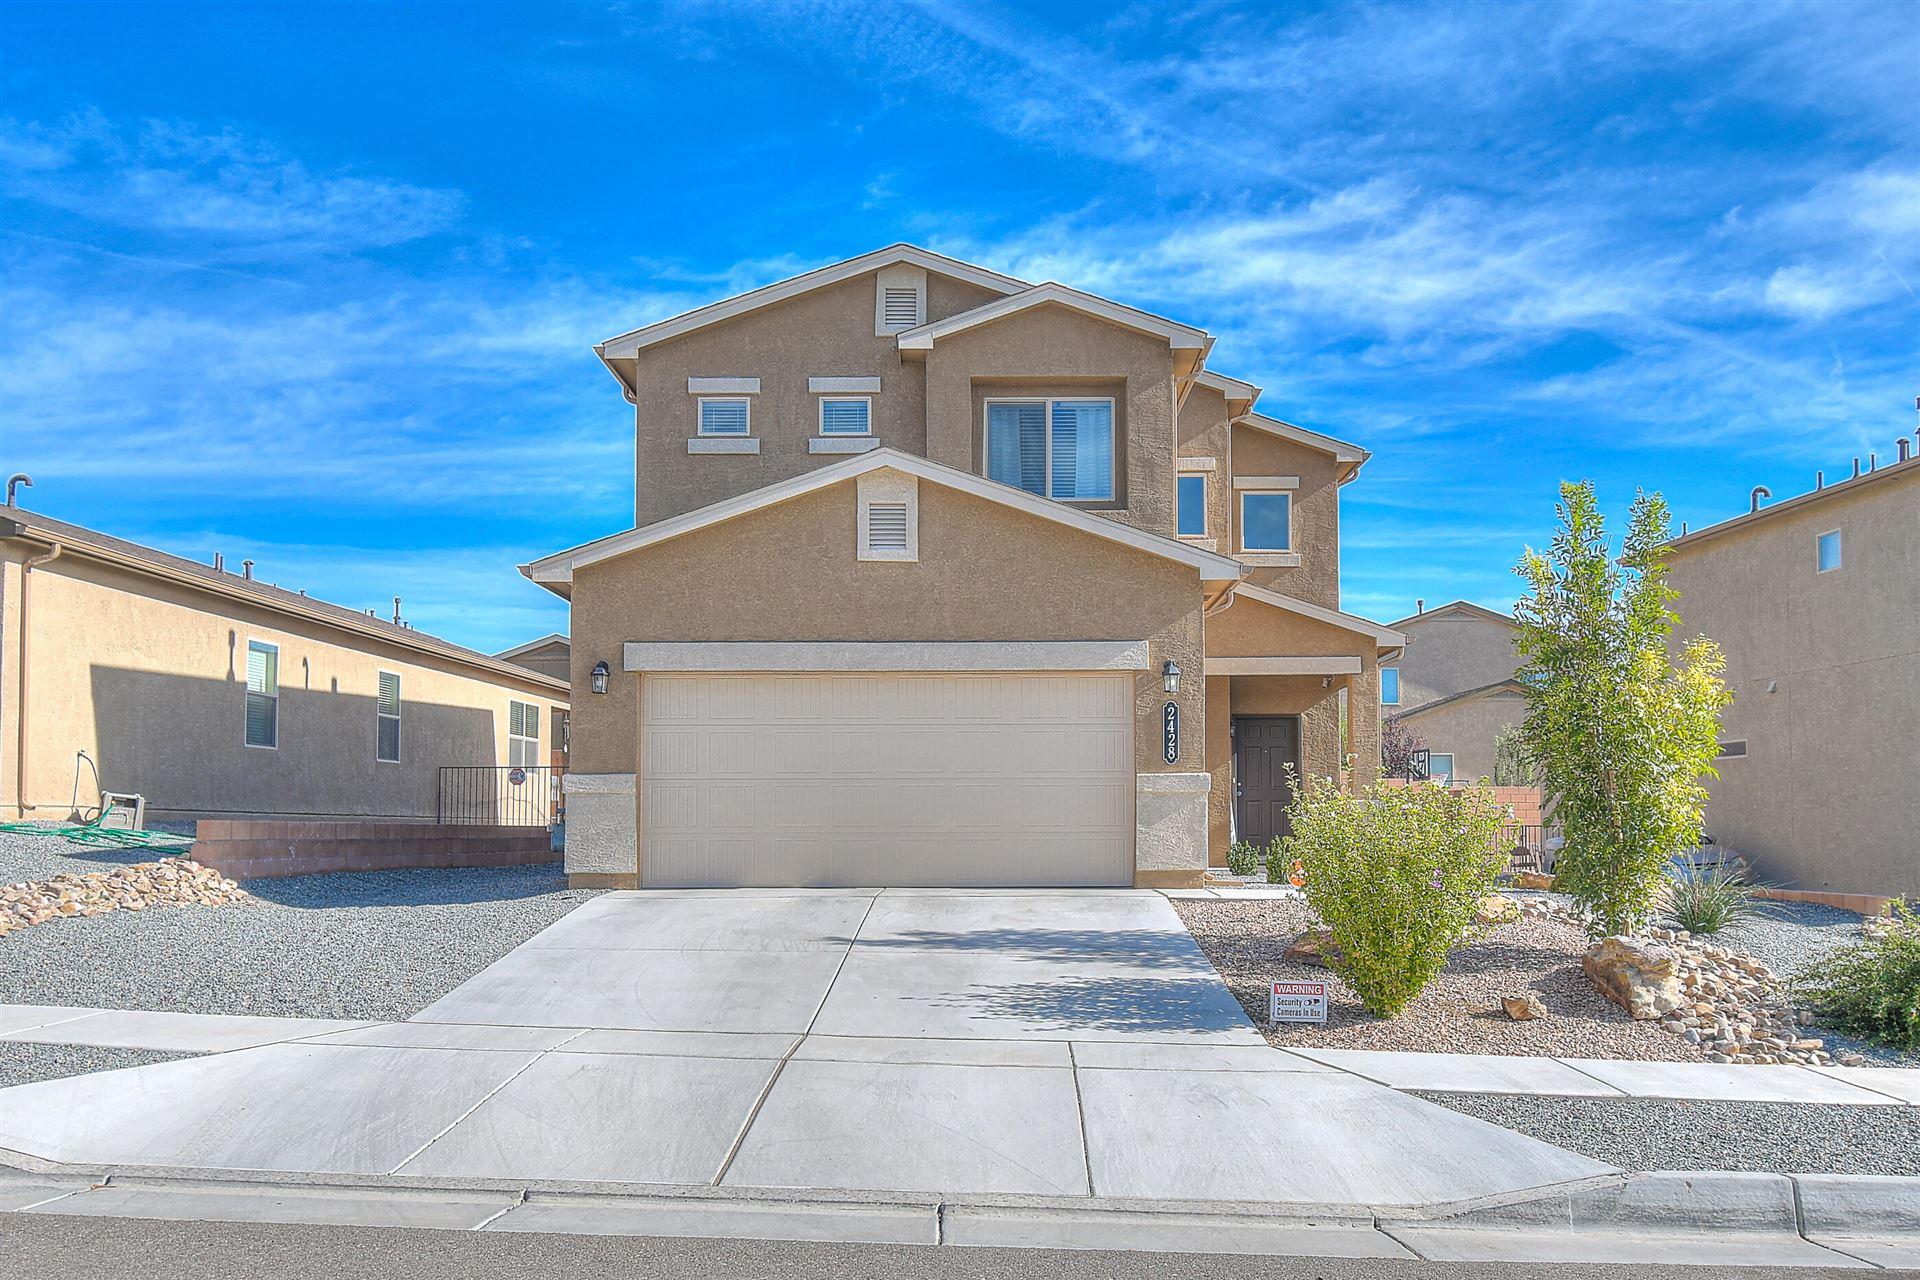 2428 DEL TIMBRE Lane SW, Albuquerque, NM 87121 - #: 1002896